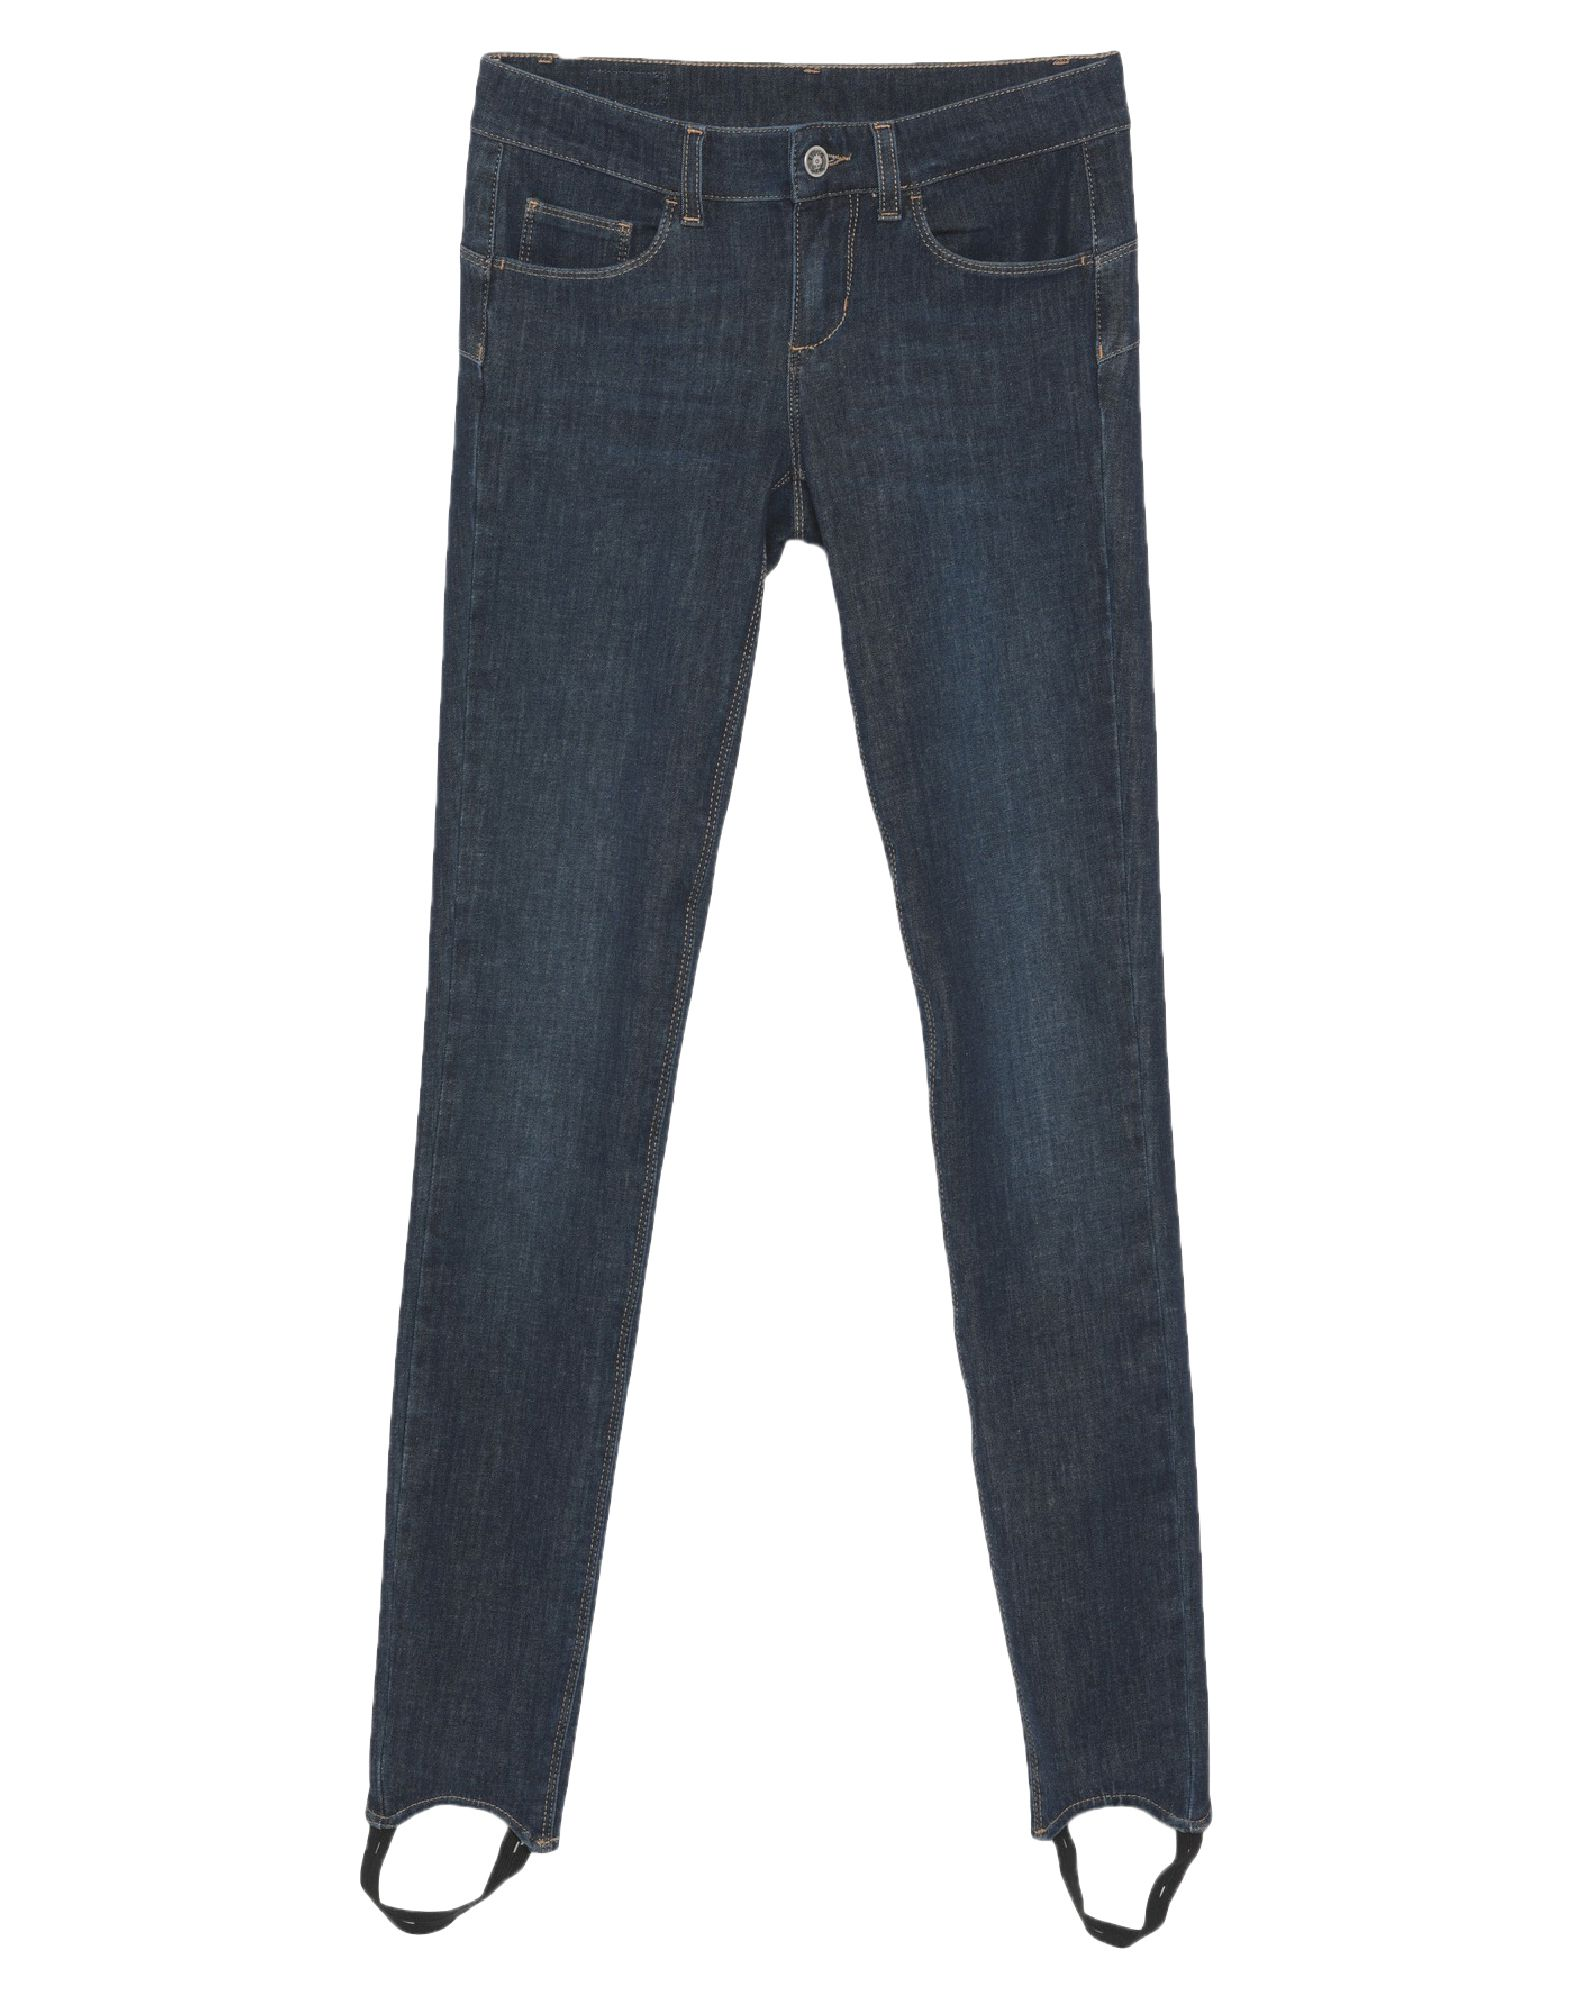 LIU JO Denim pants - Item 42807003